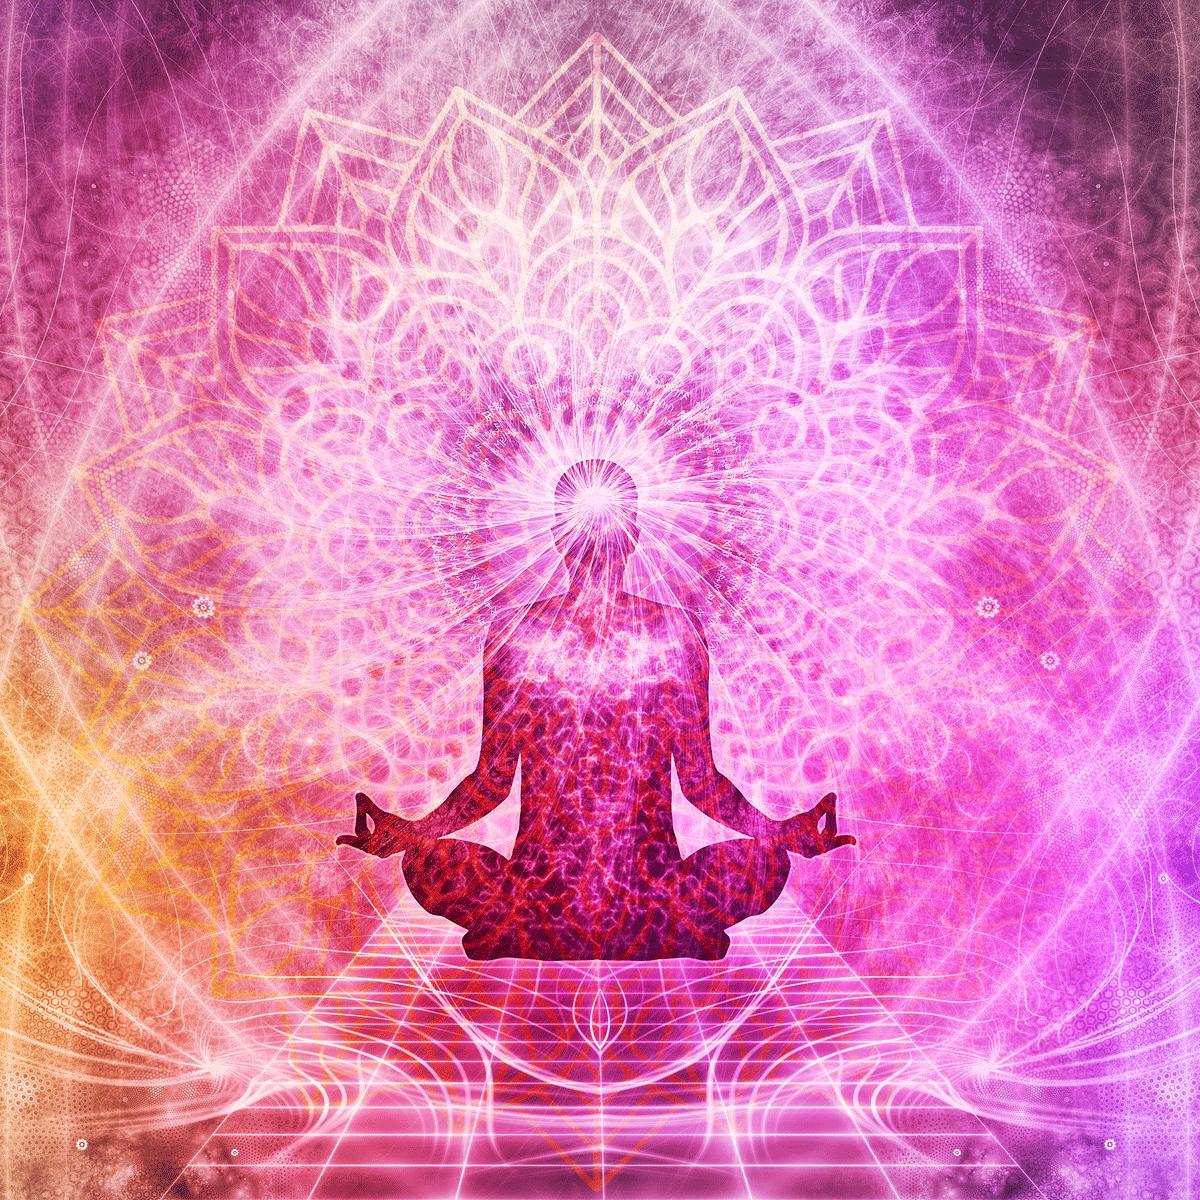 Article: Be Your Own Guru | magicalguidance.com